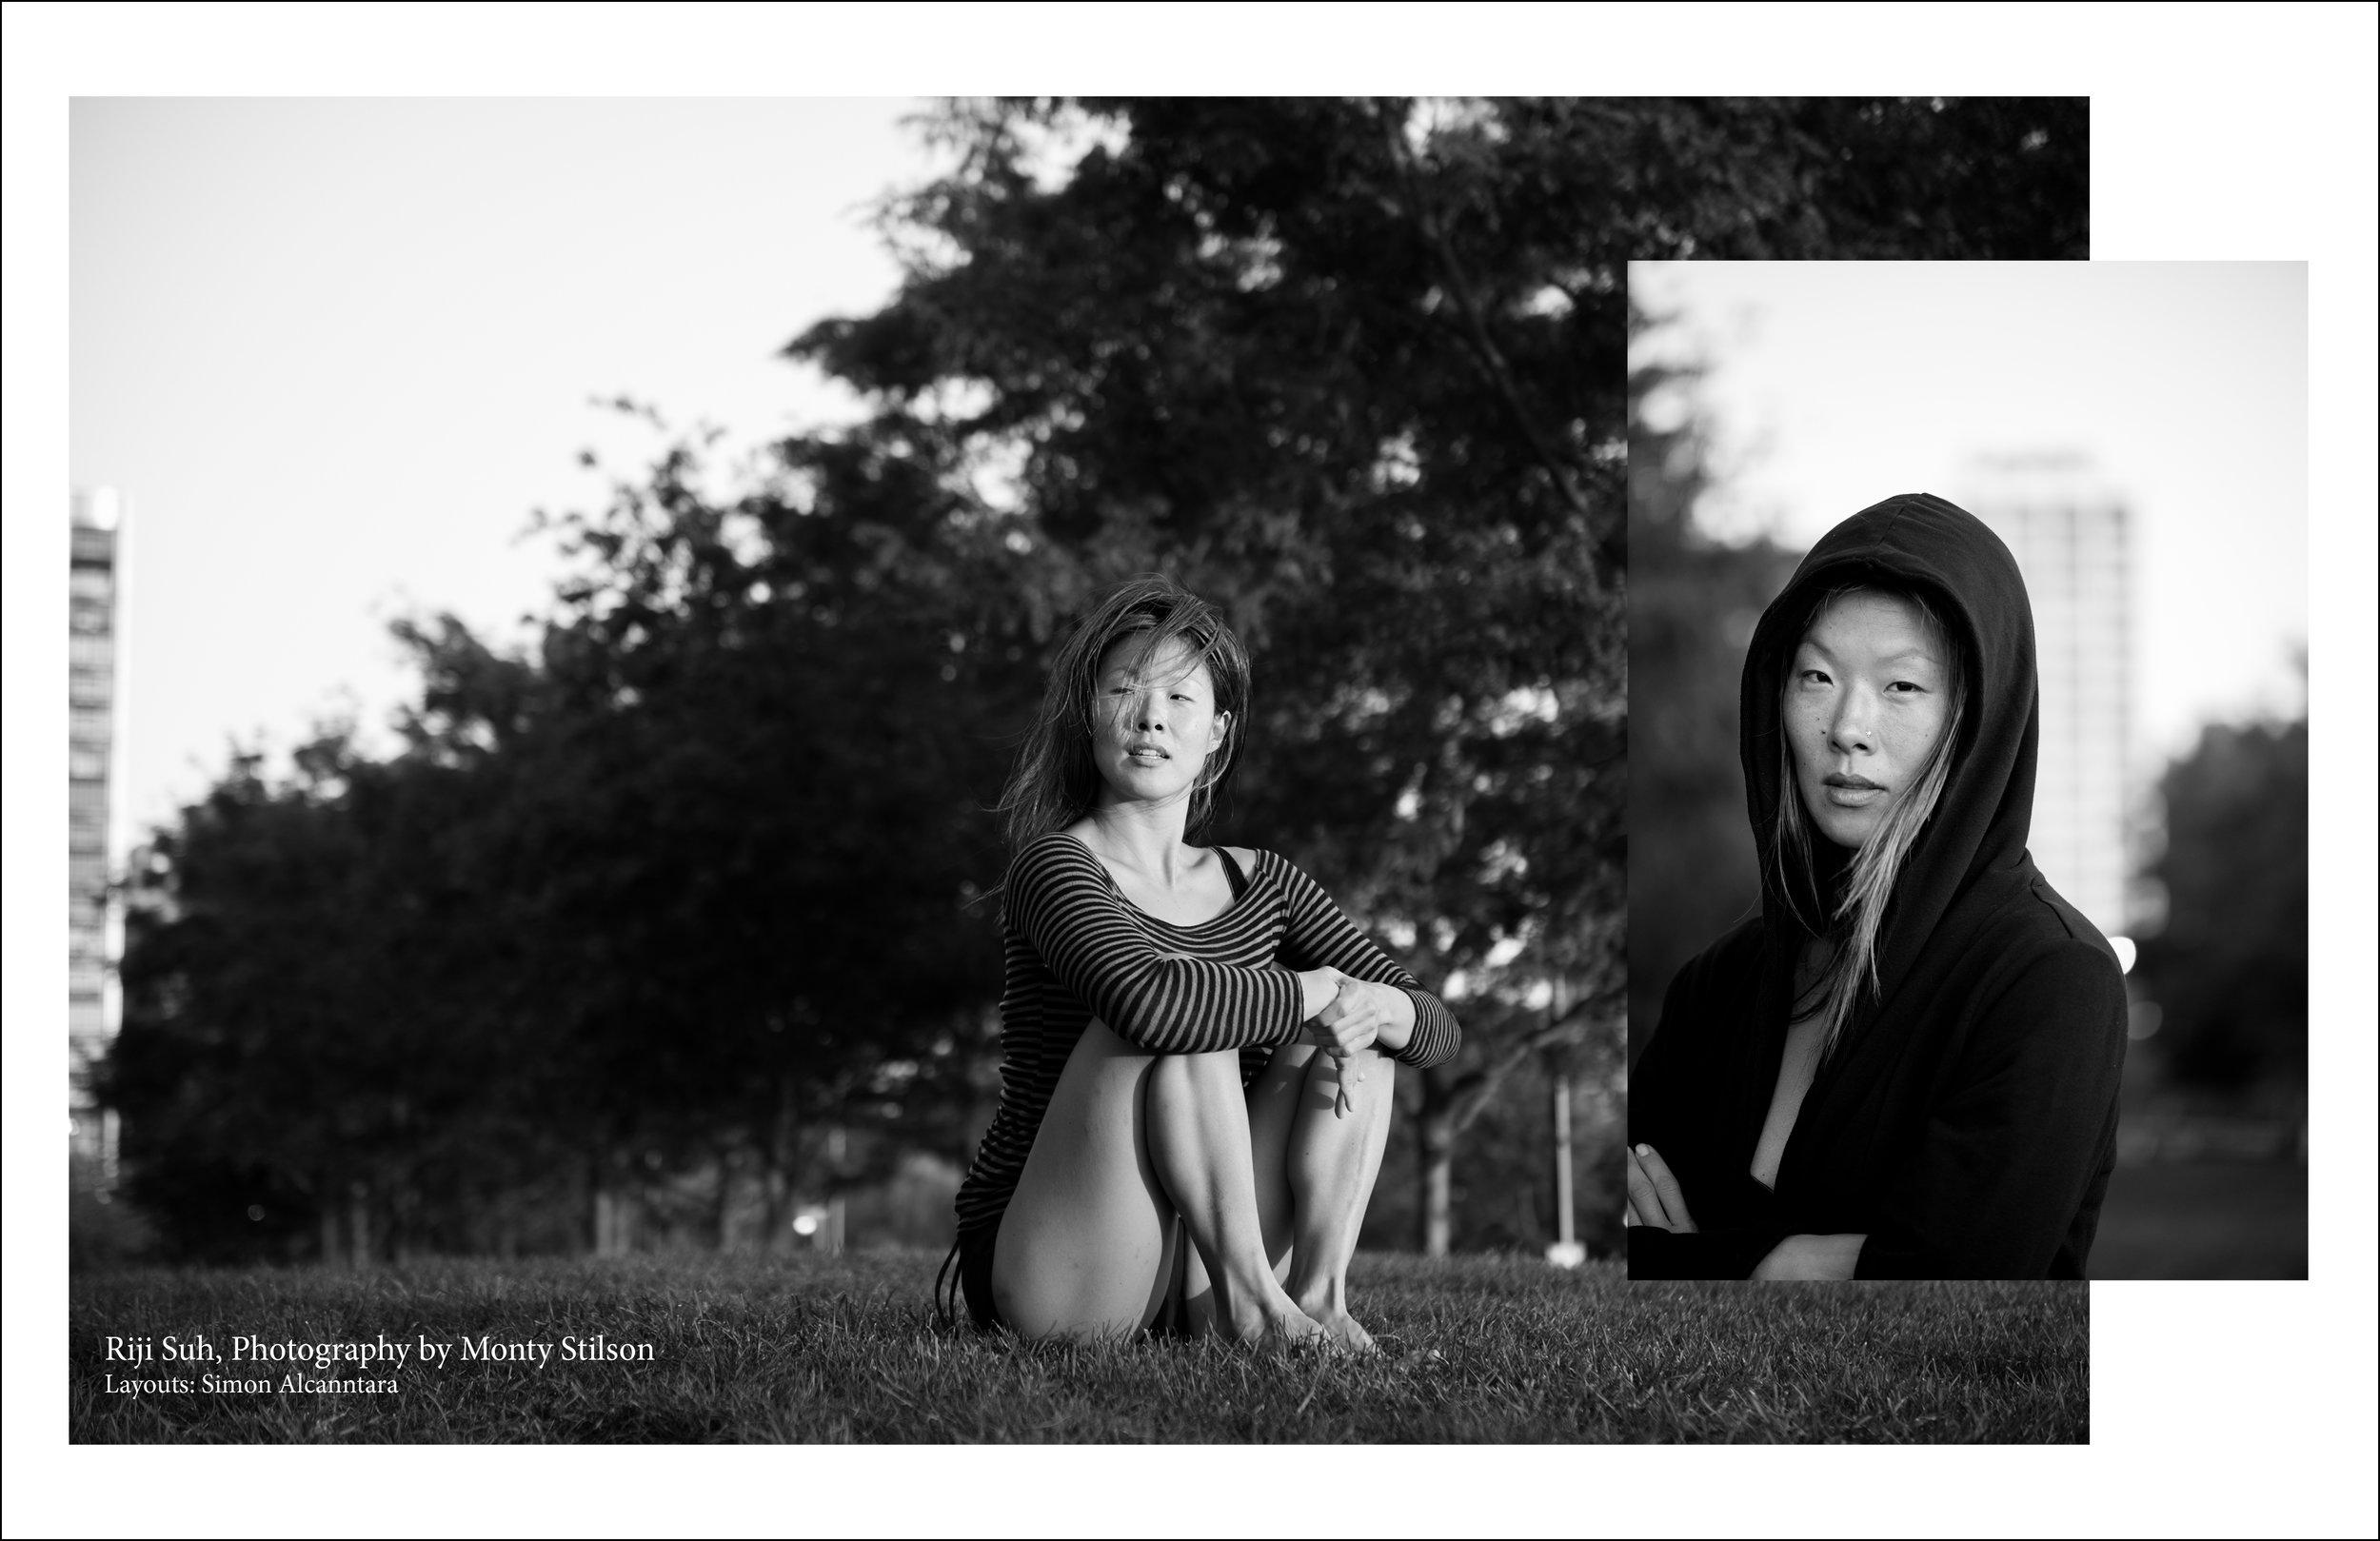 Photography by Monty Stilson